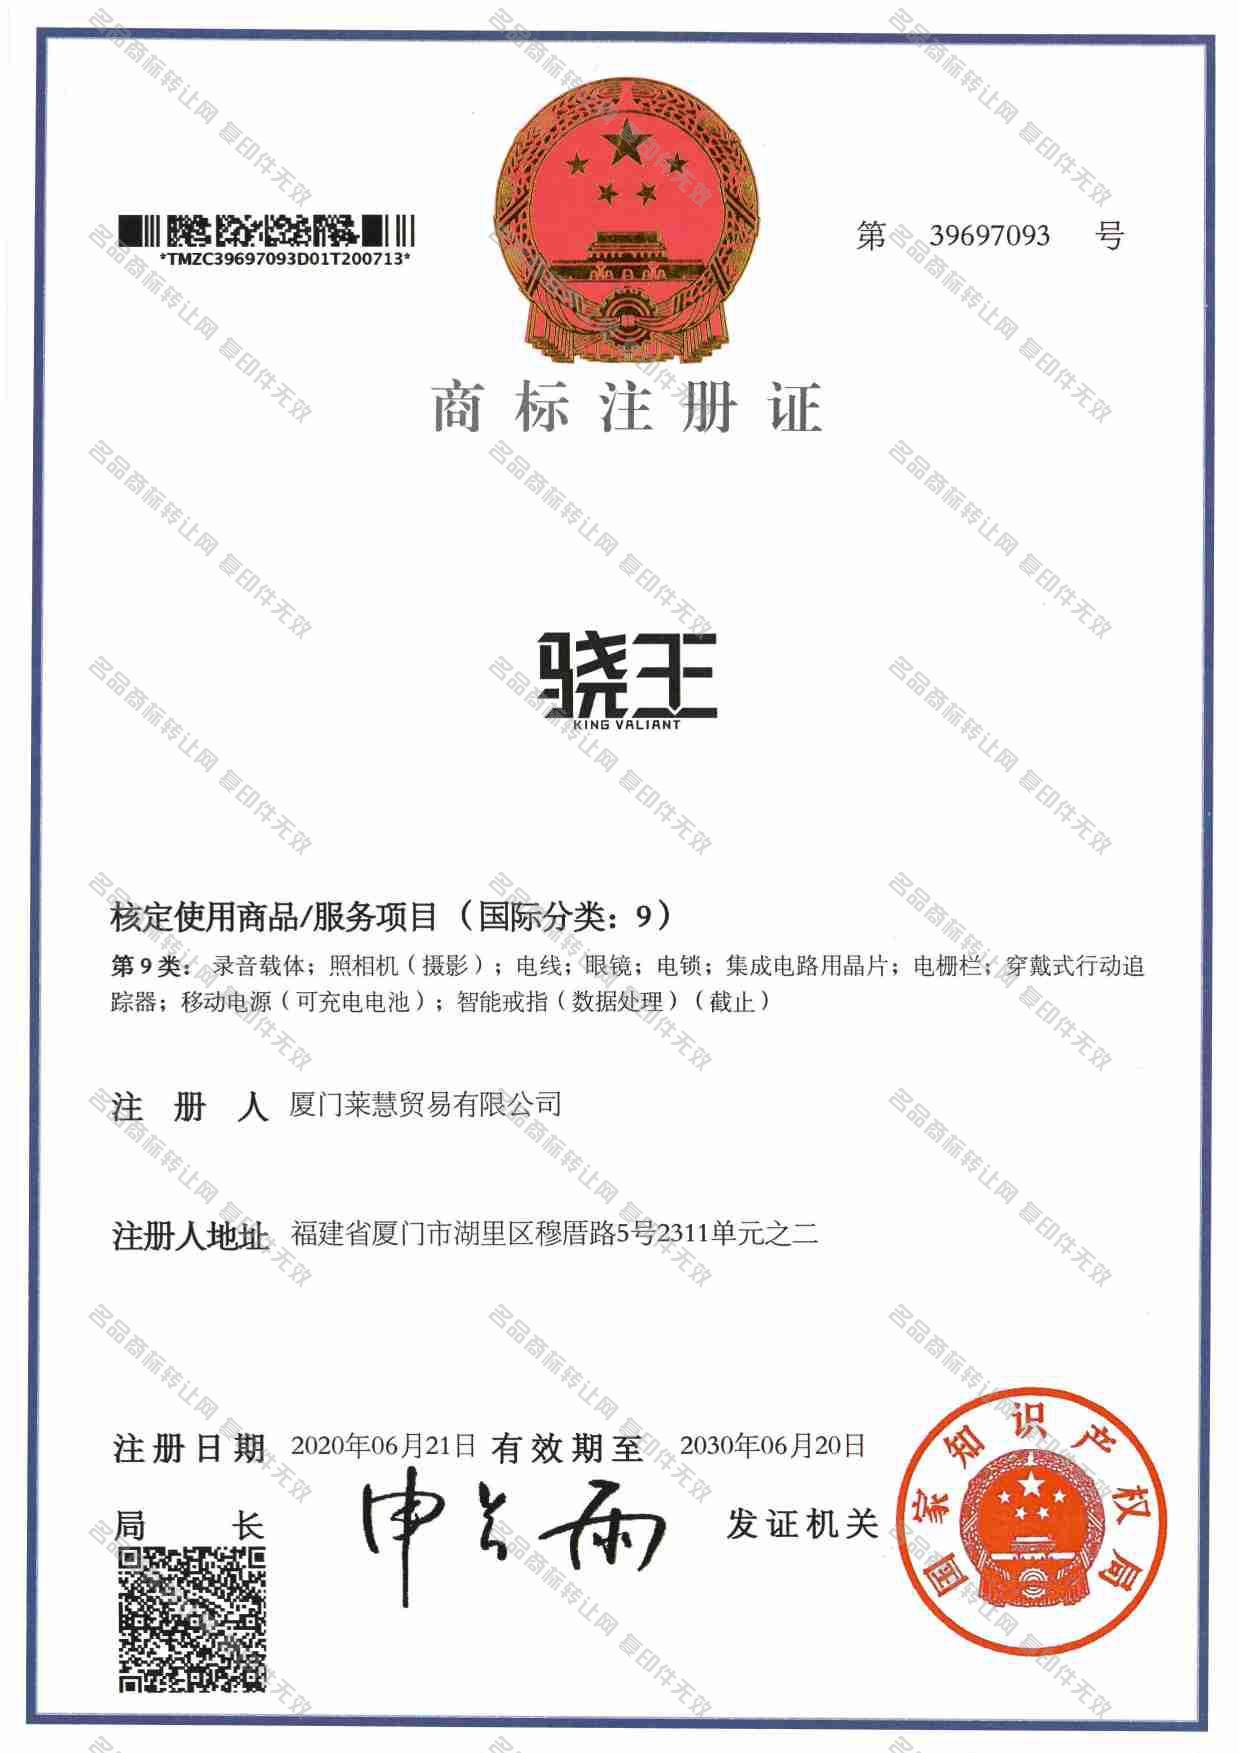 骁王 KING VALIANT注册证